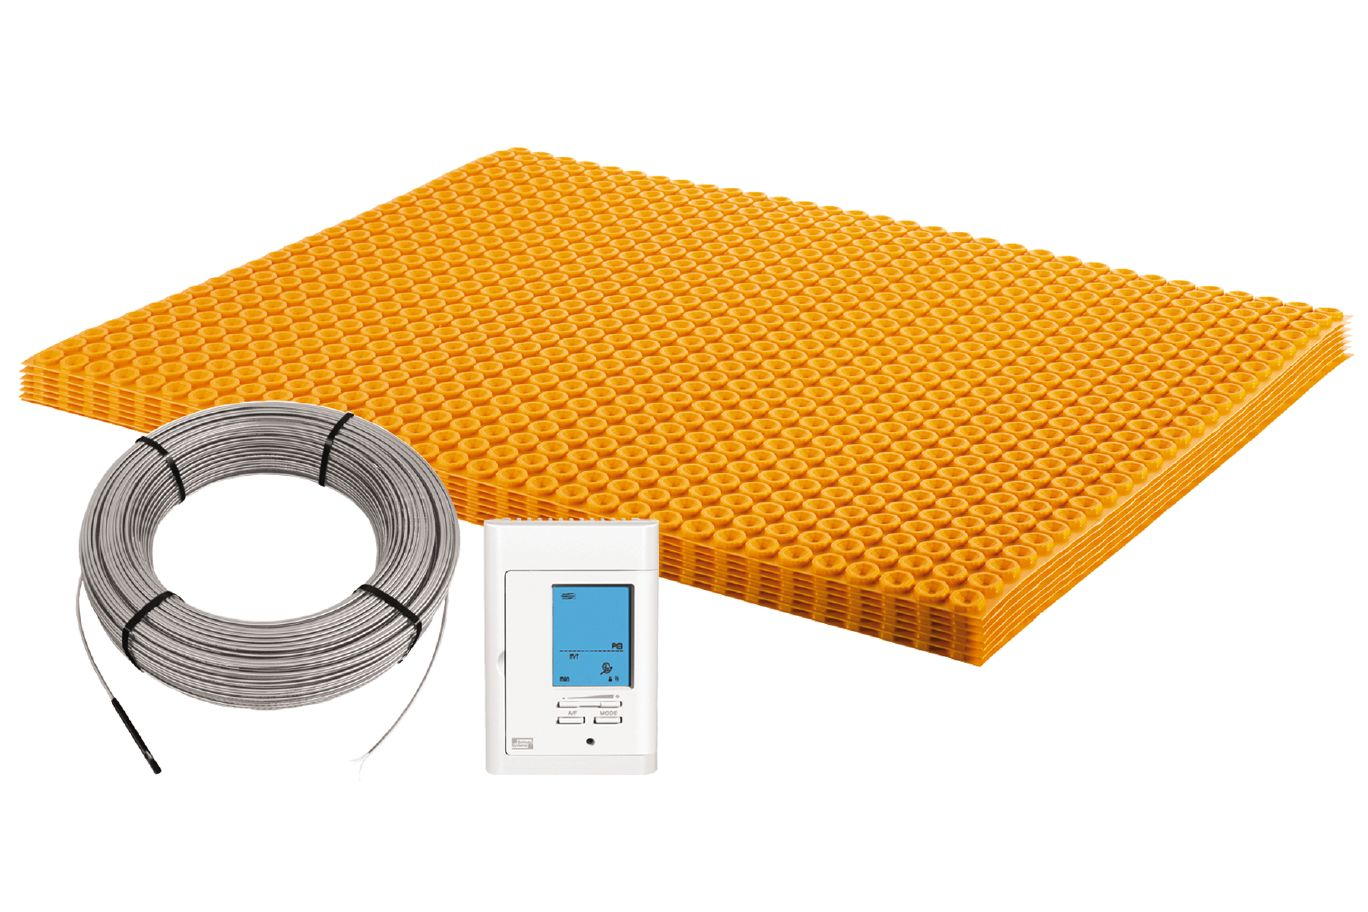 Schmutter Ditra Heat Kit